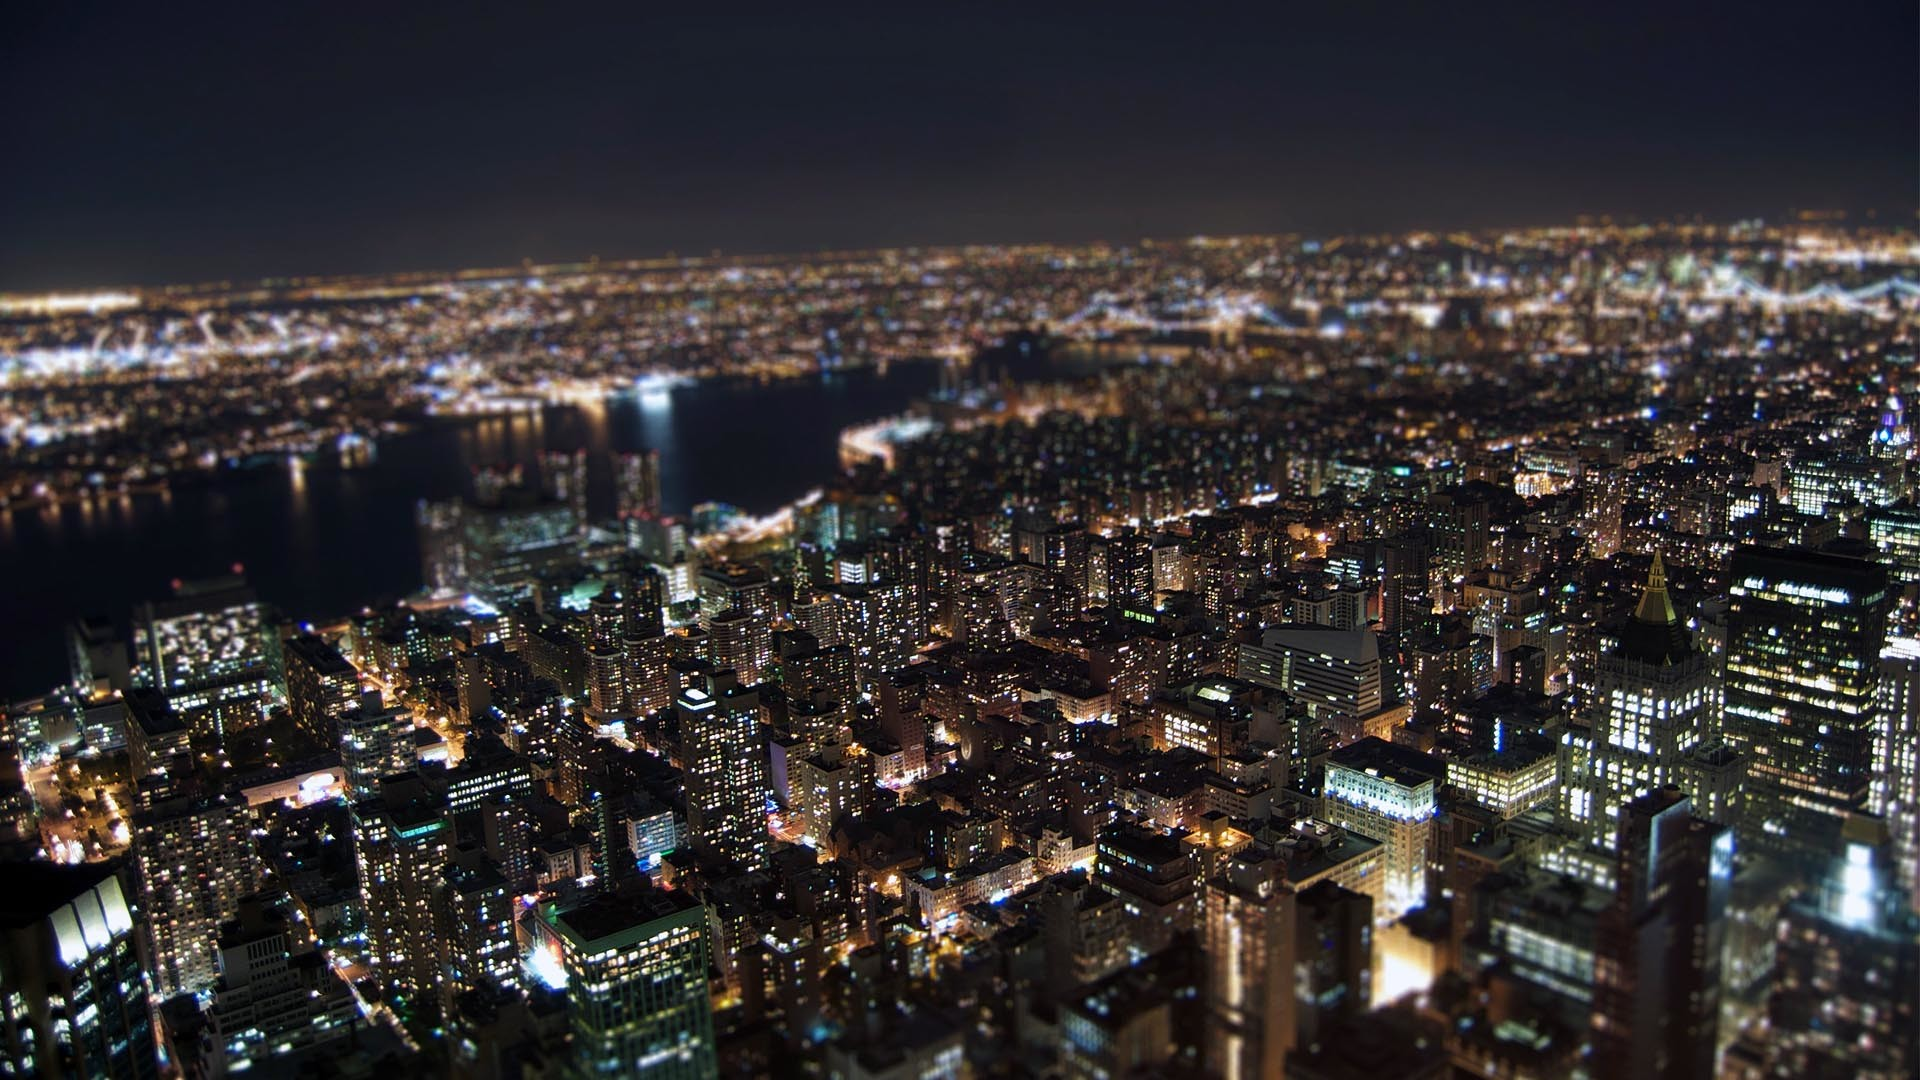 New York Night HD Wallpaper. Â«